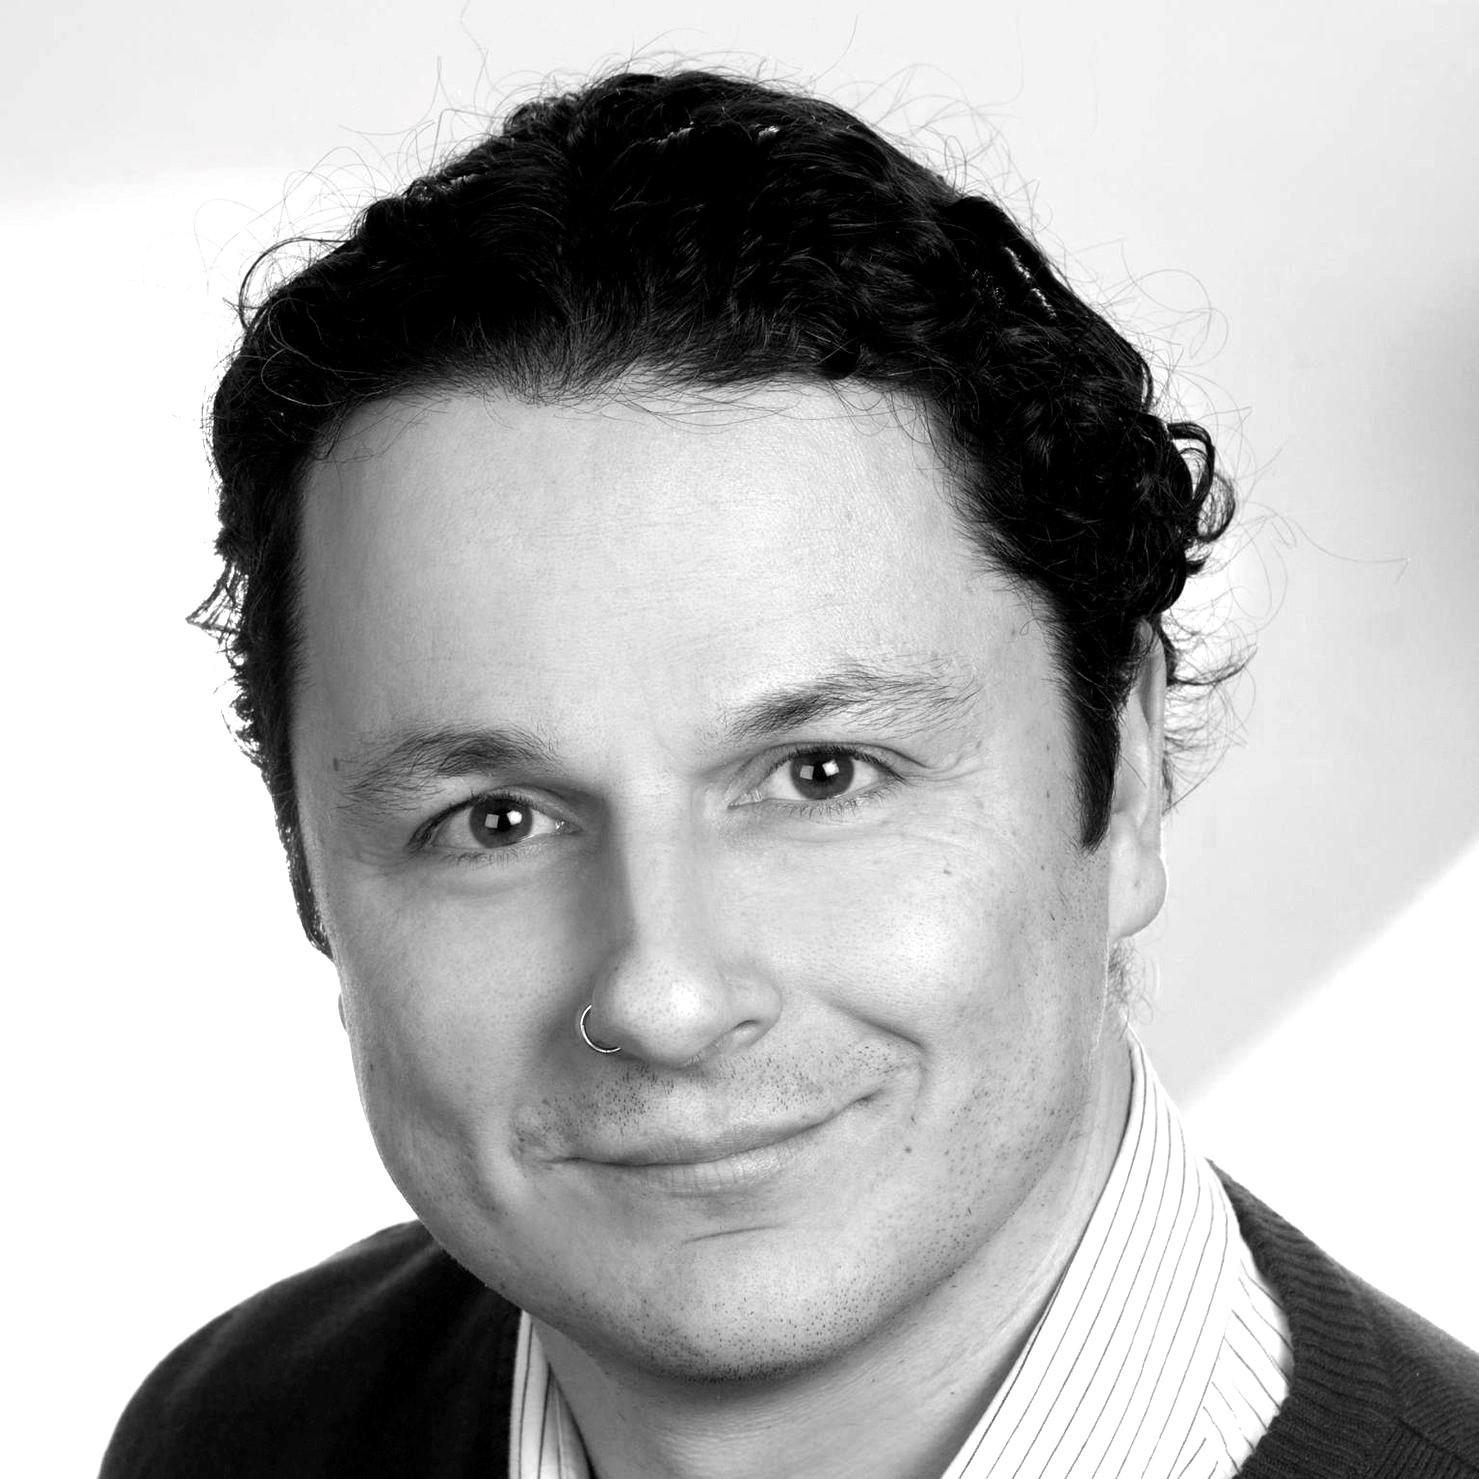 Marco Engel